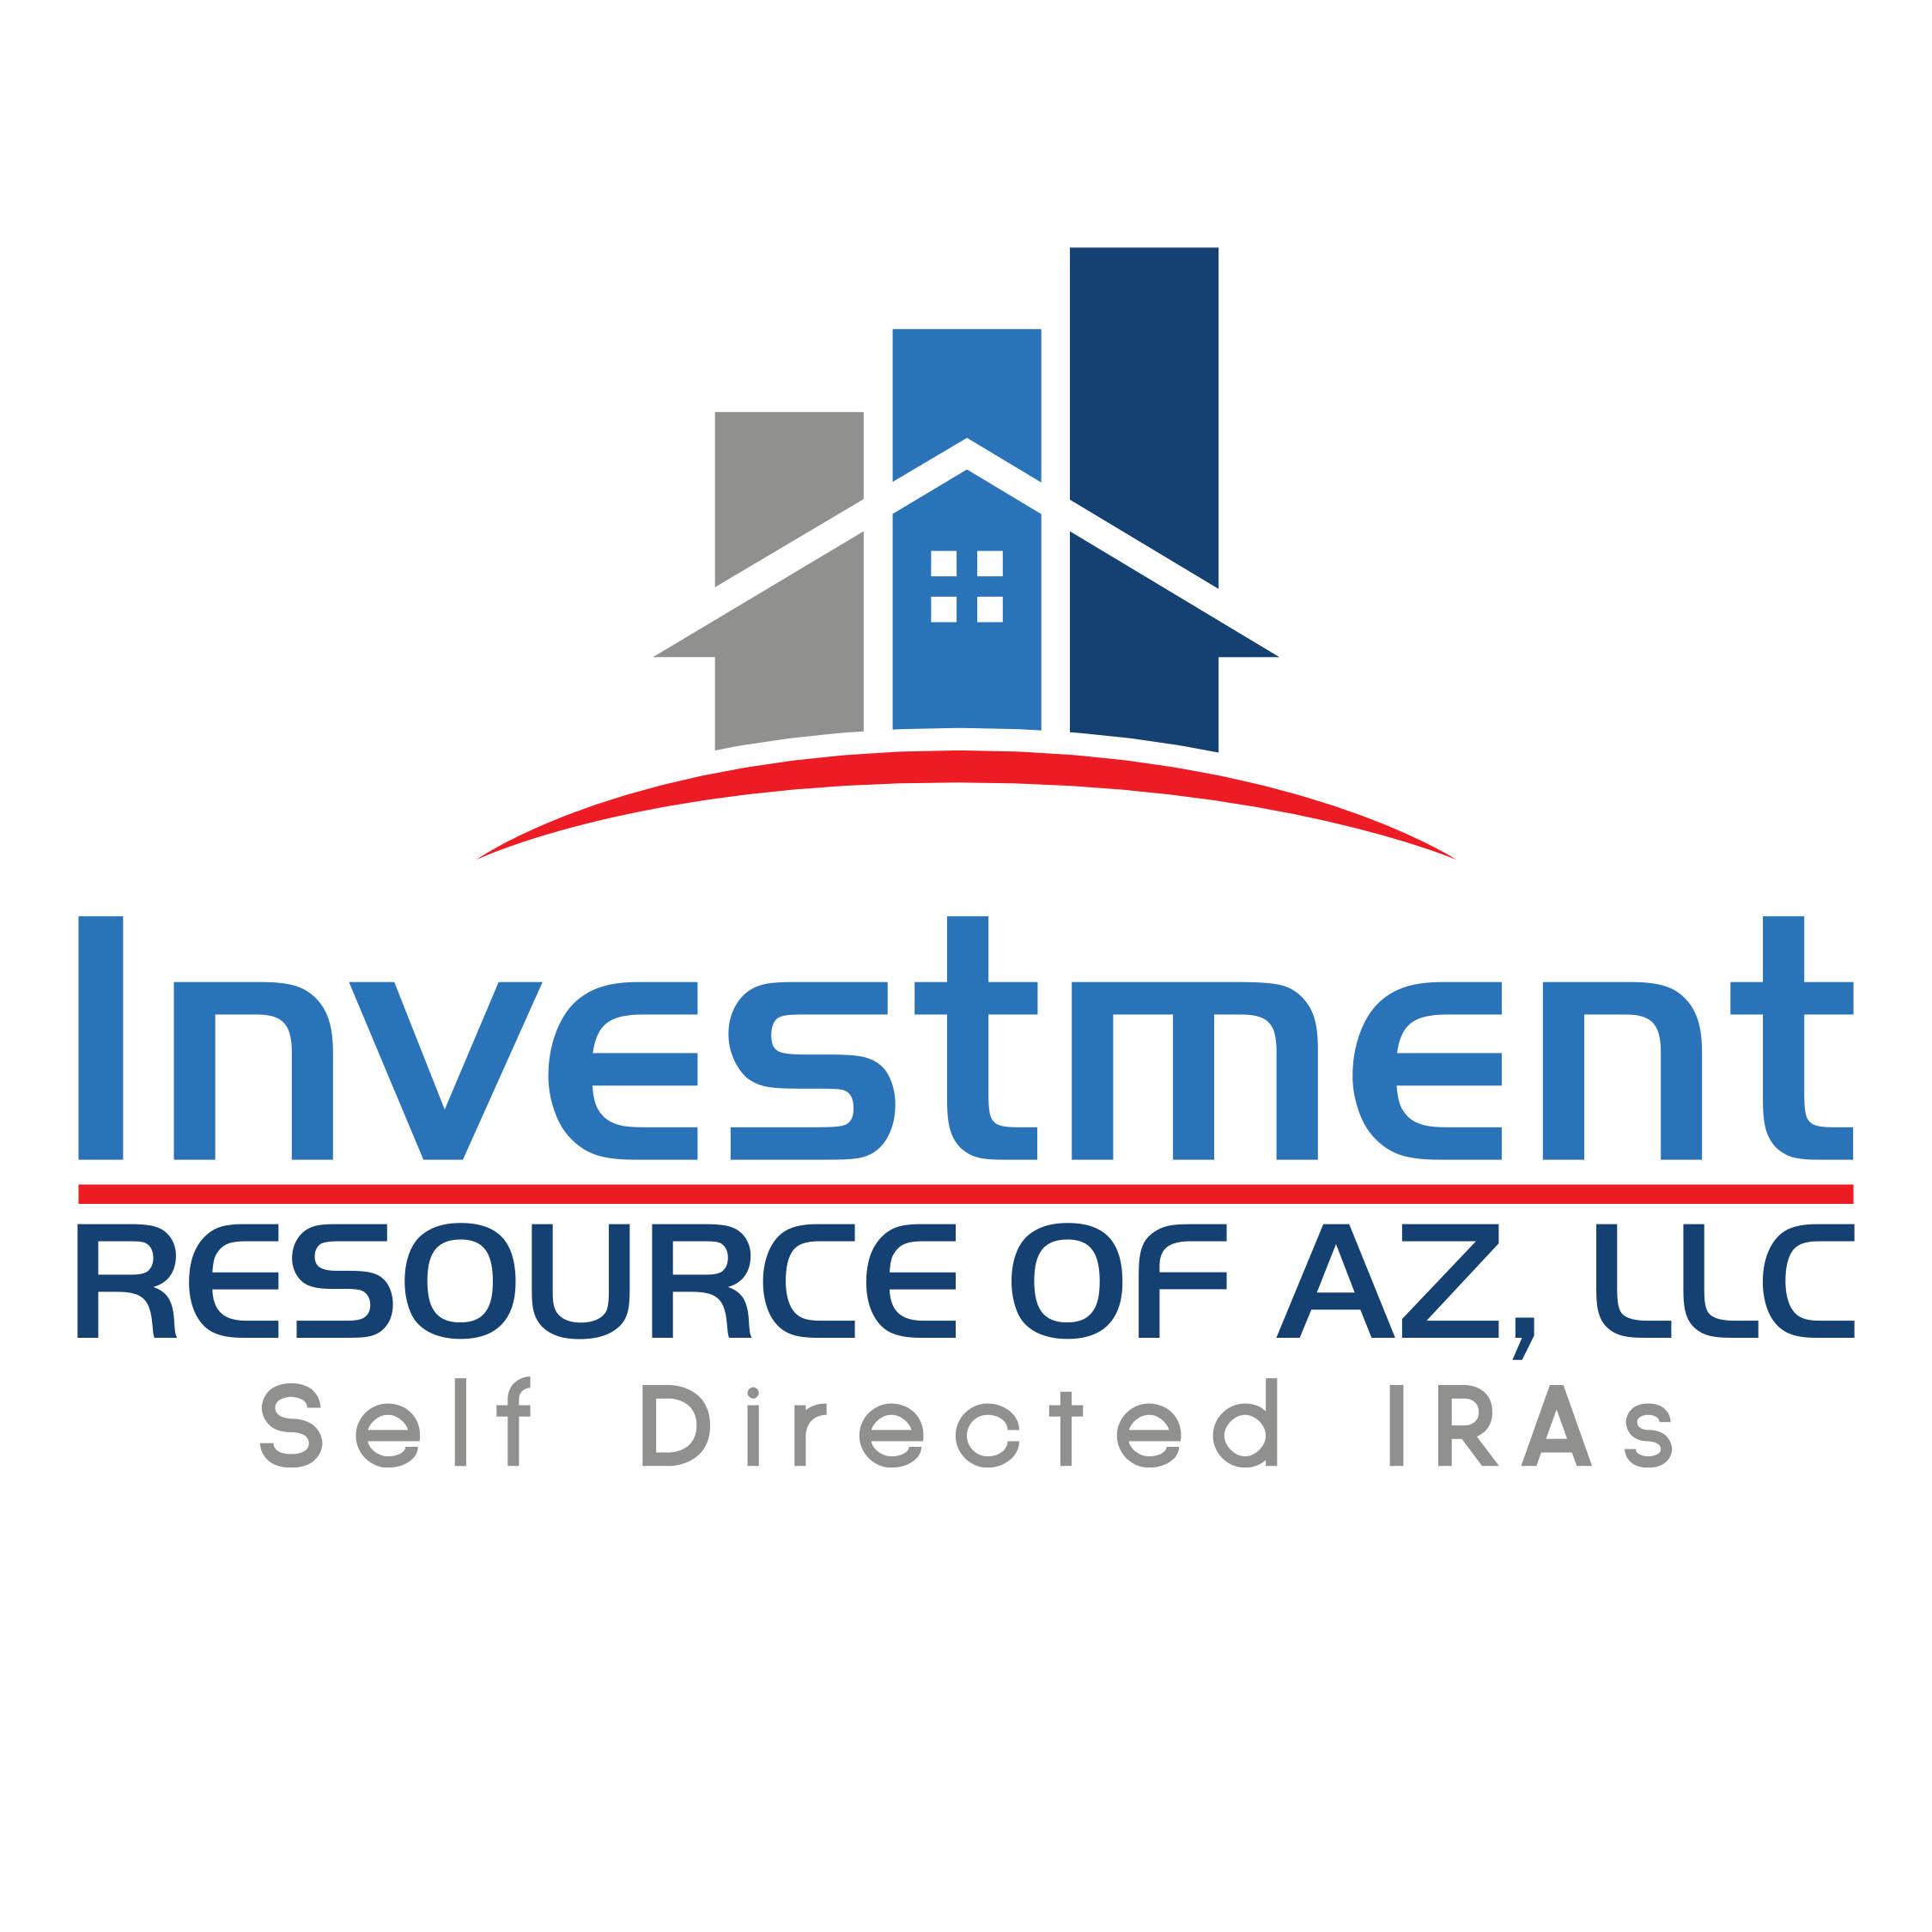 Investment Resource of AZ, LLC